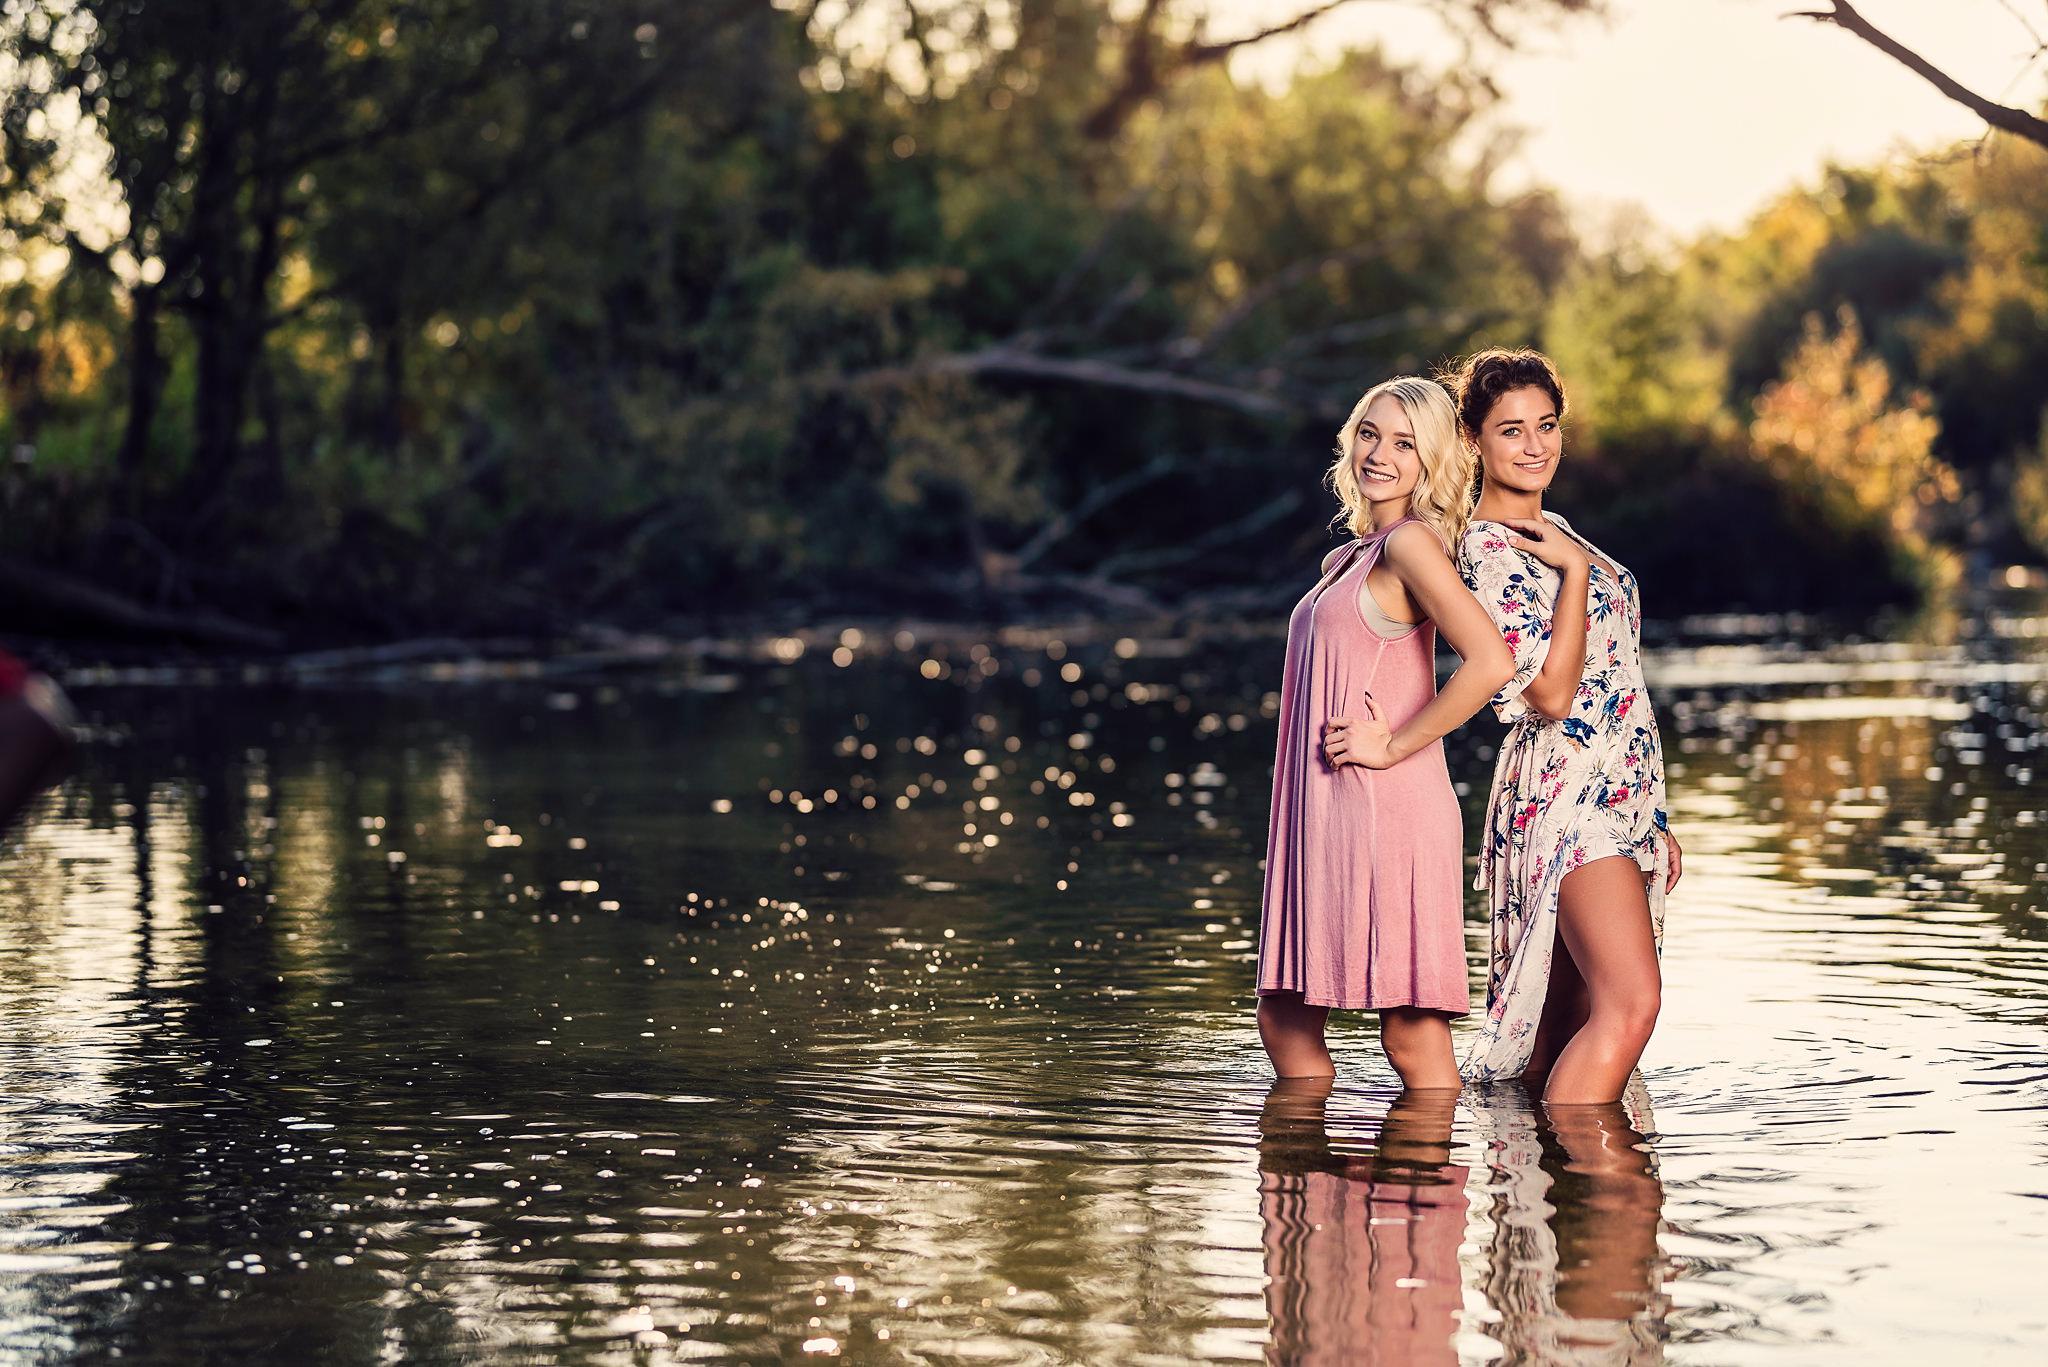 delafield-fish-hatchery-river-senior-pictures